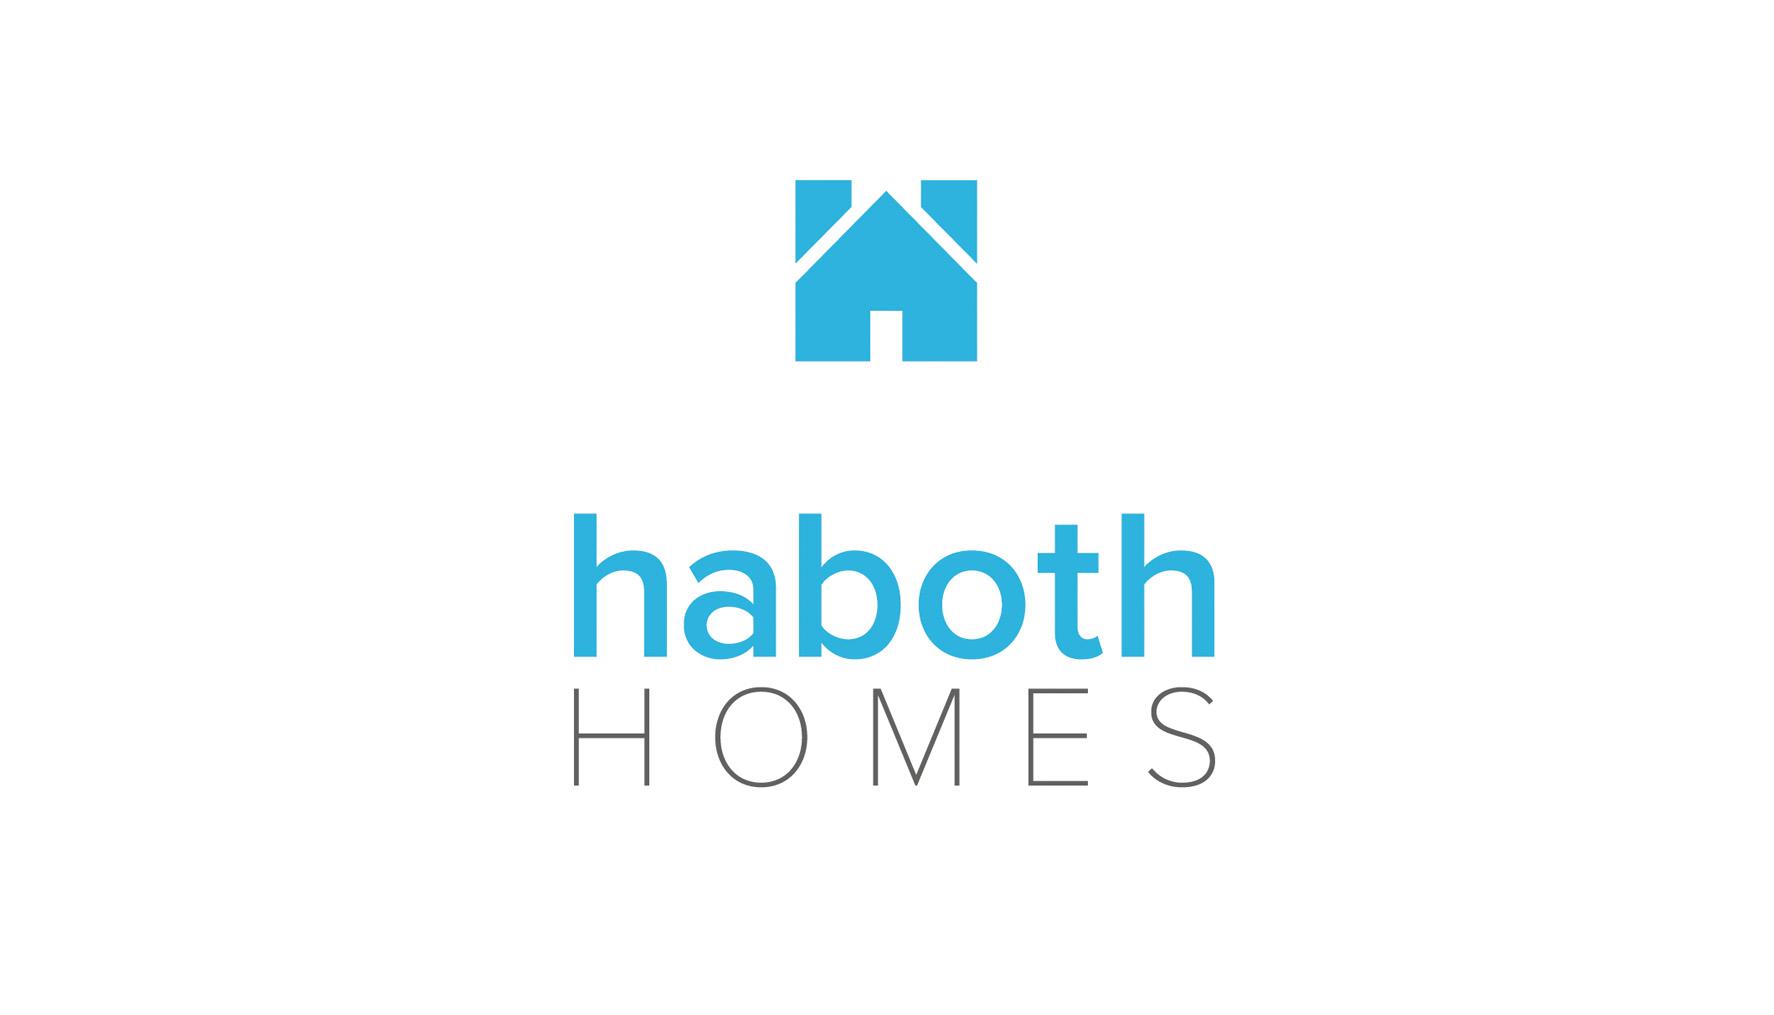 Haboth Homes